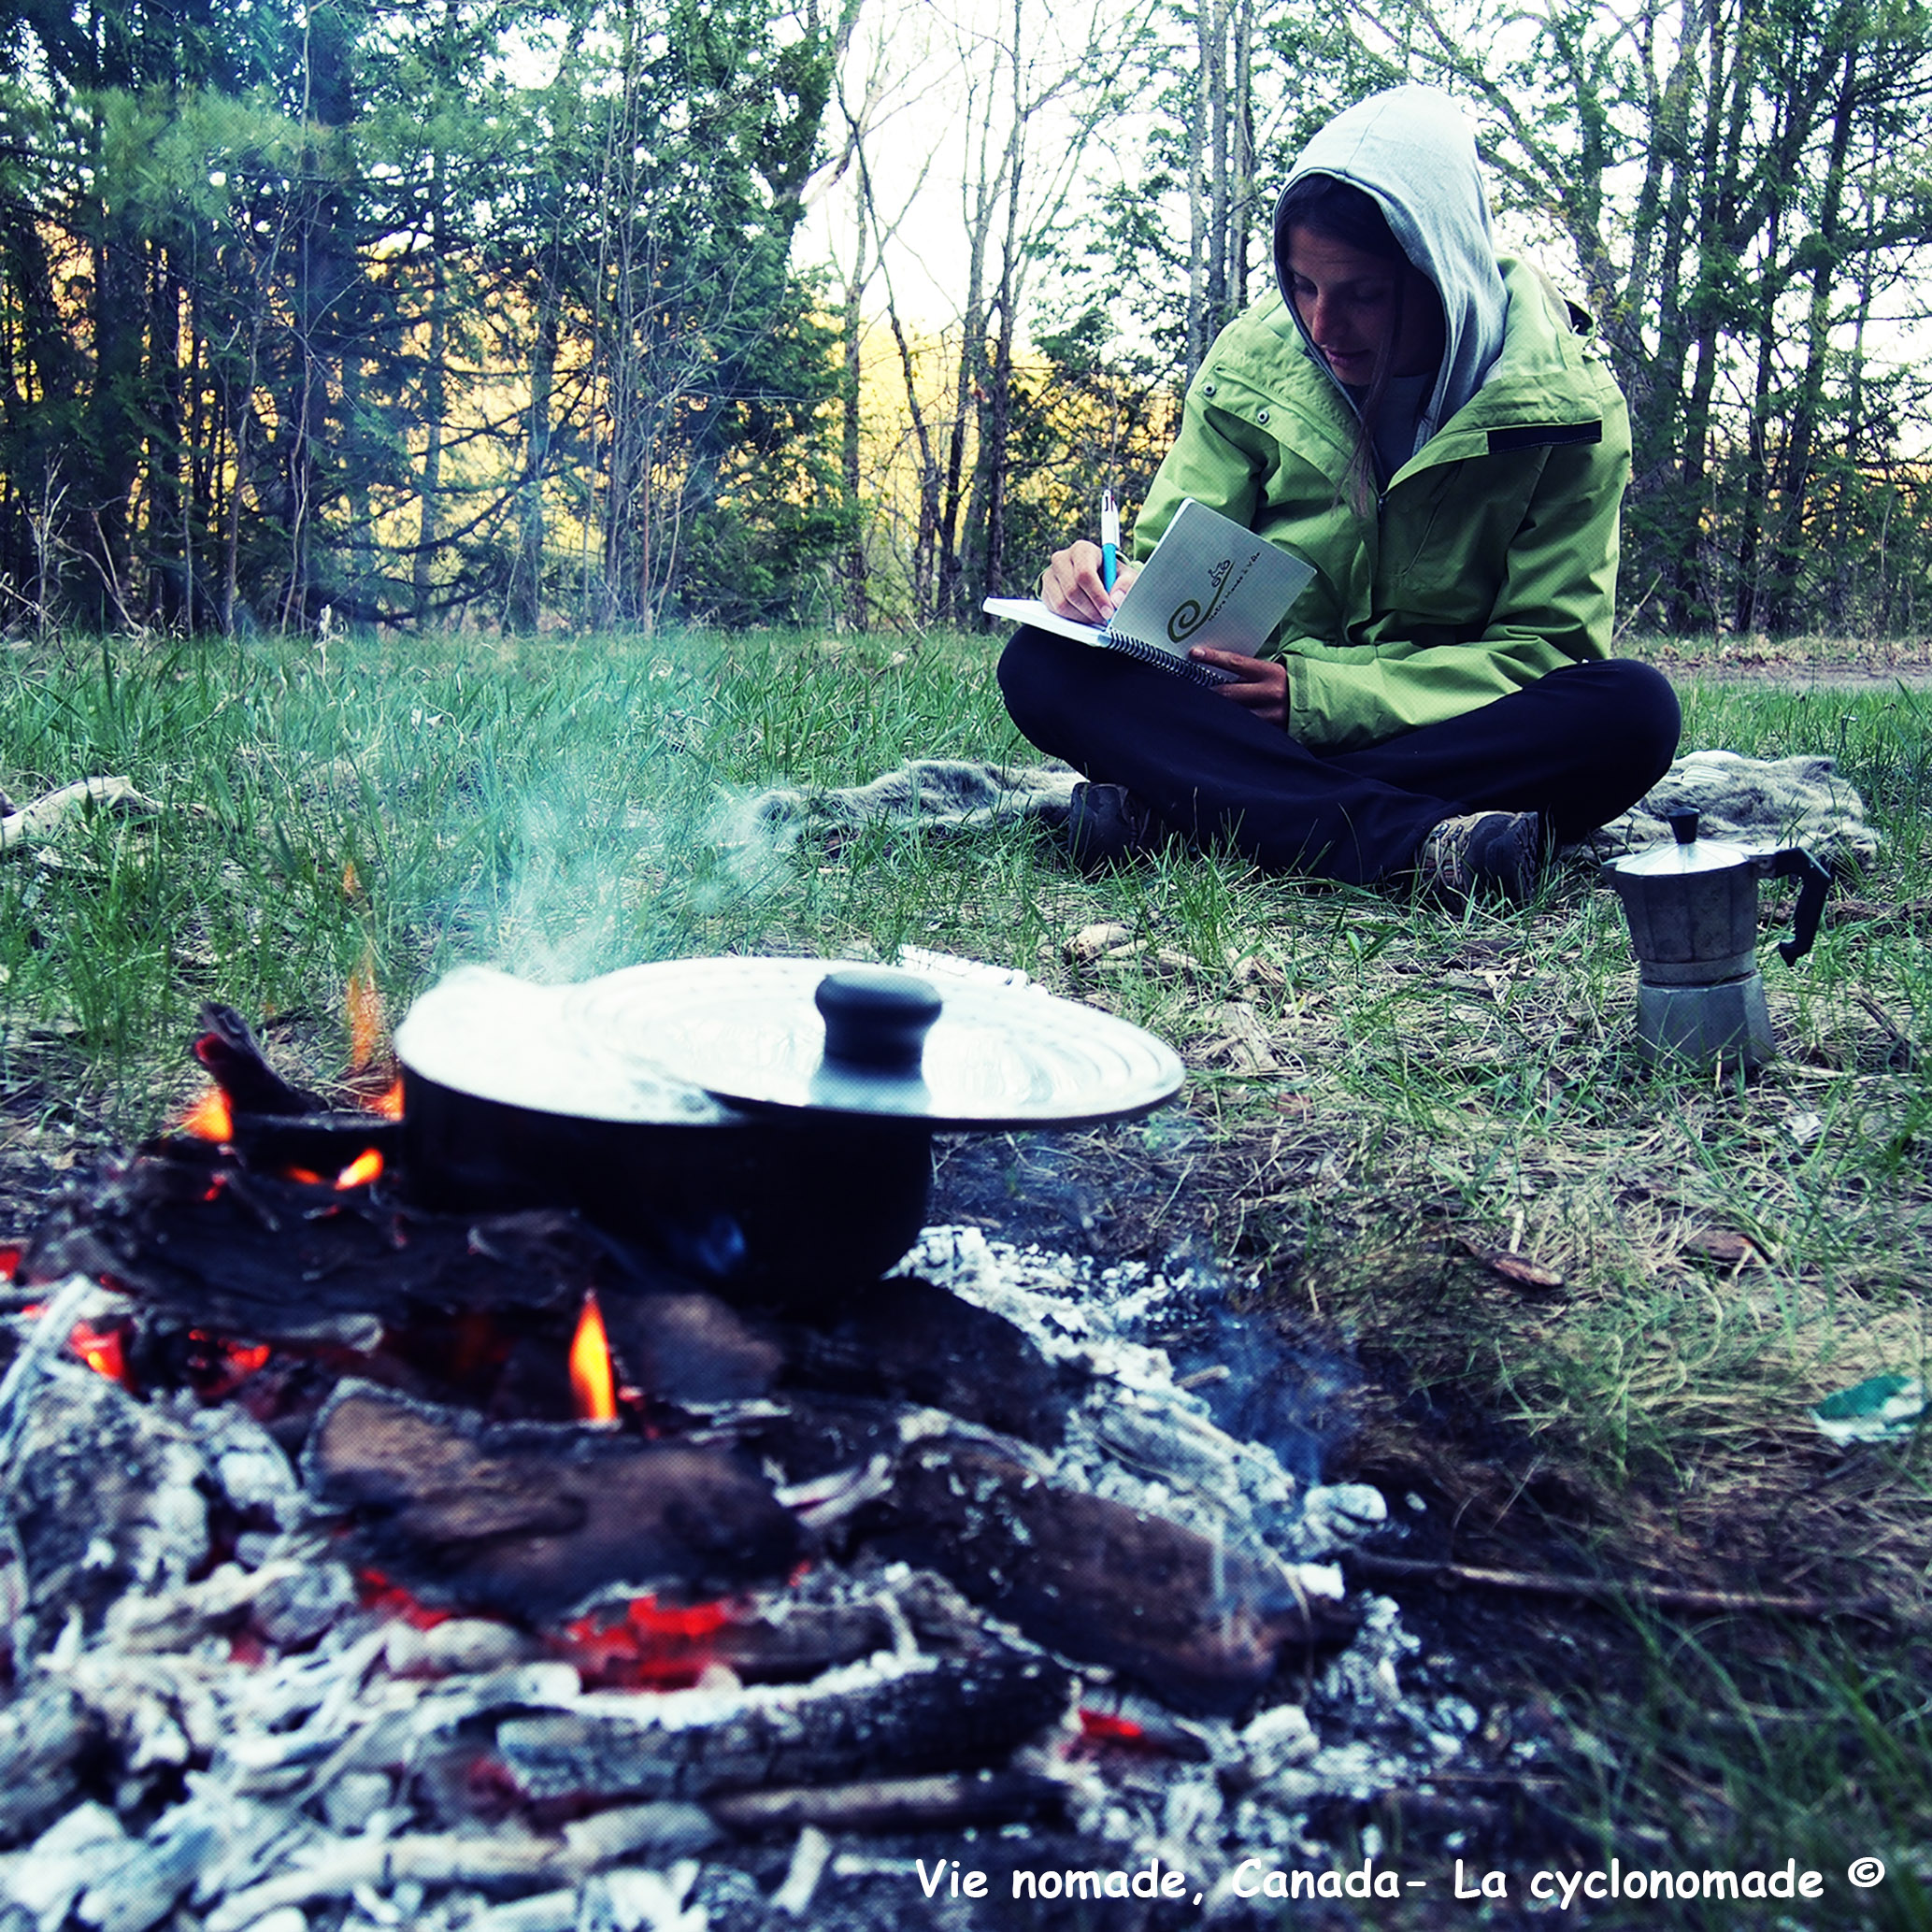 Vie nomade